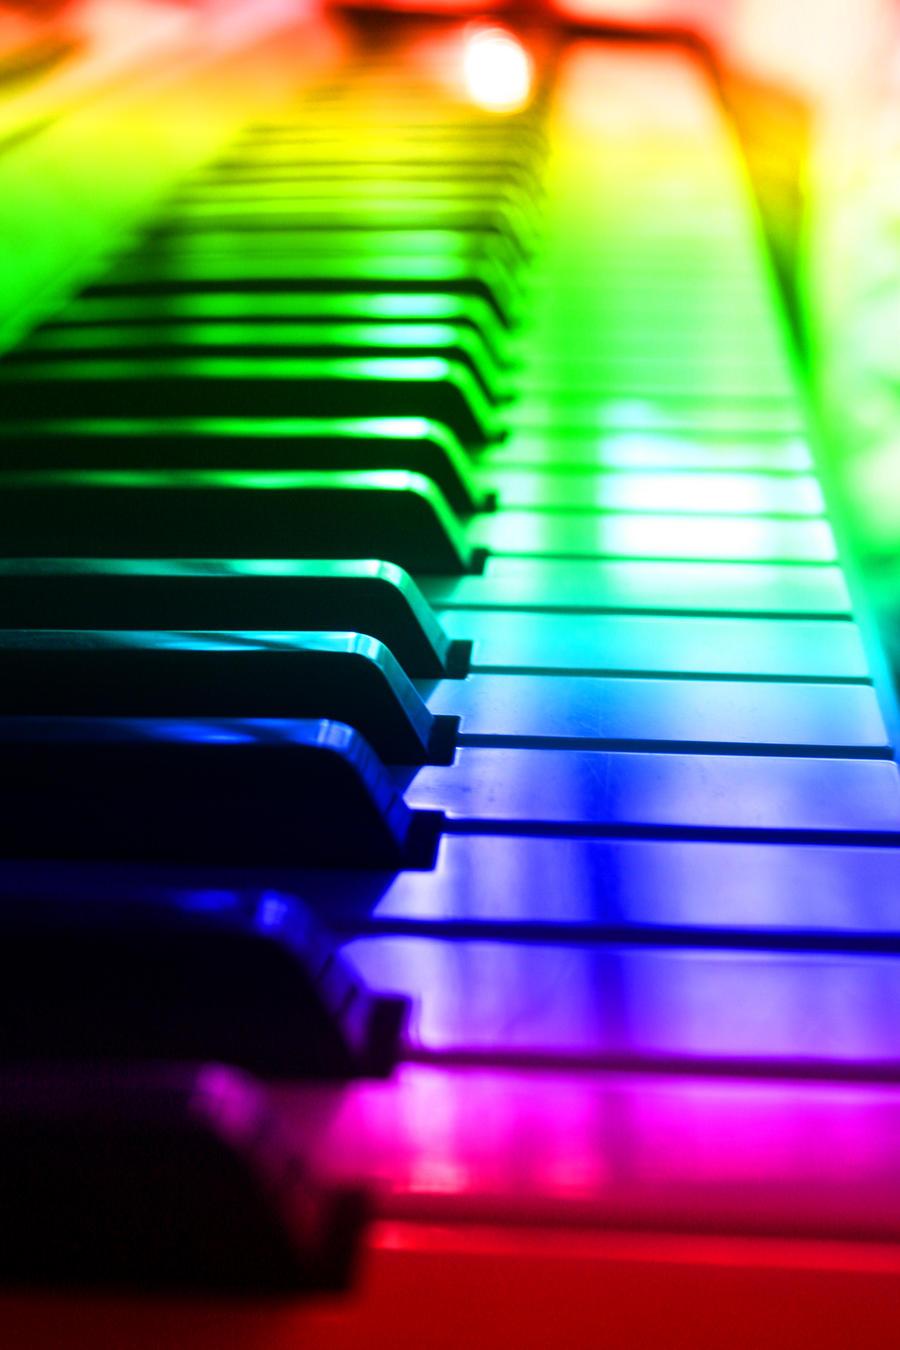 rainbow music by gunkly on deviantart